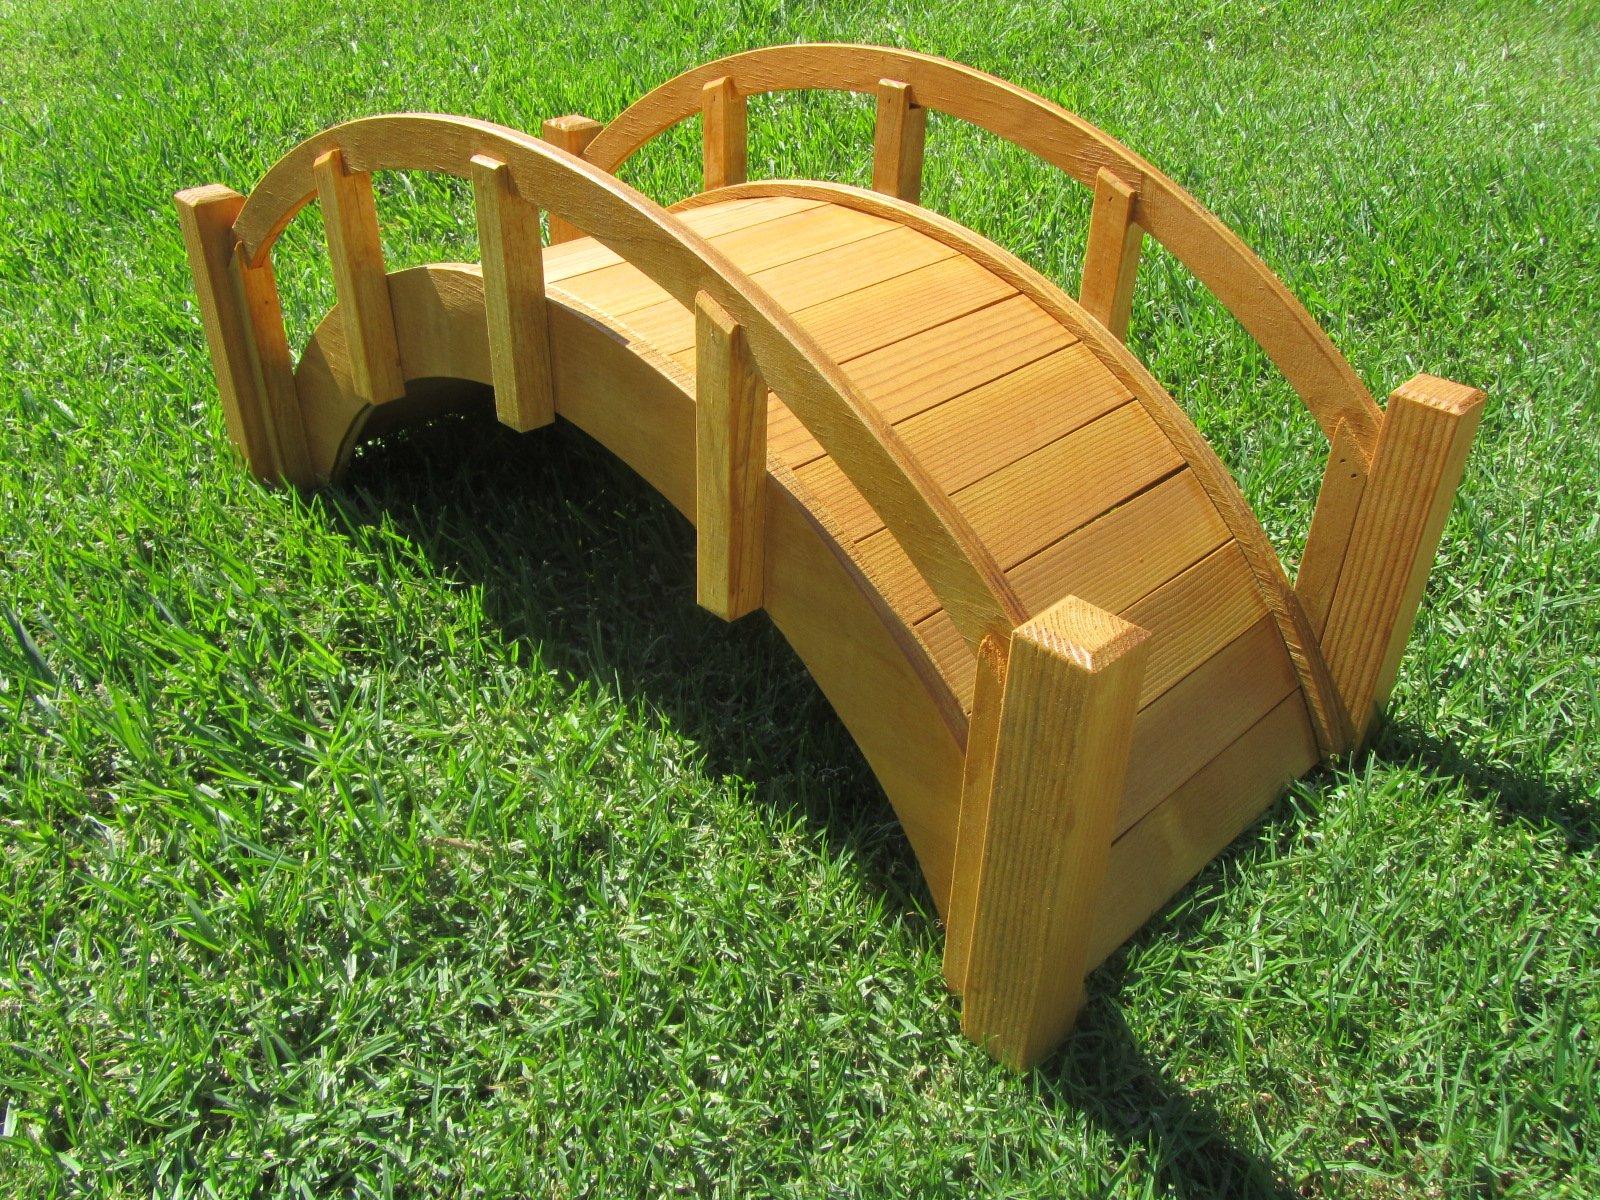 SamsGazebos Miniature Japanese Waterproofed Wood Garden Bridge, 25-Inch, Tan by SamsGazebosTM (Image #3)